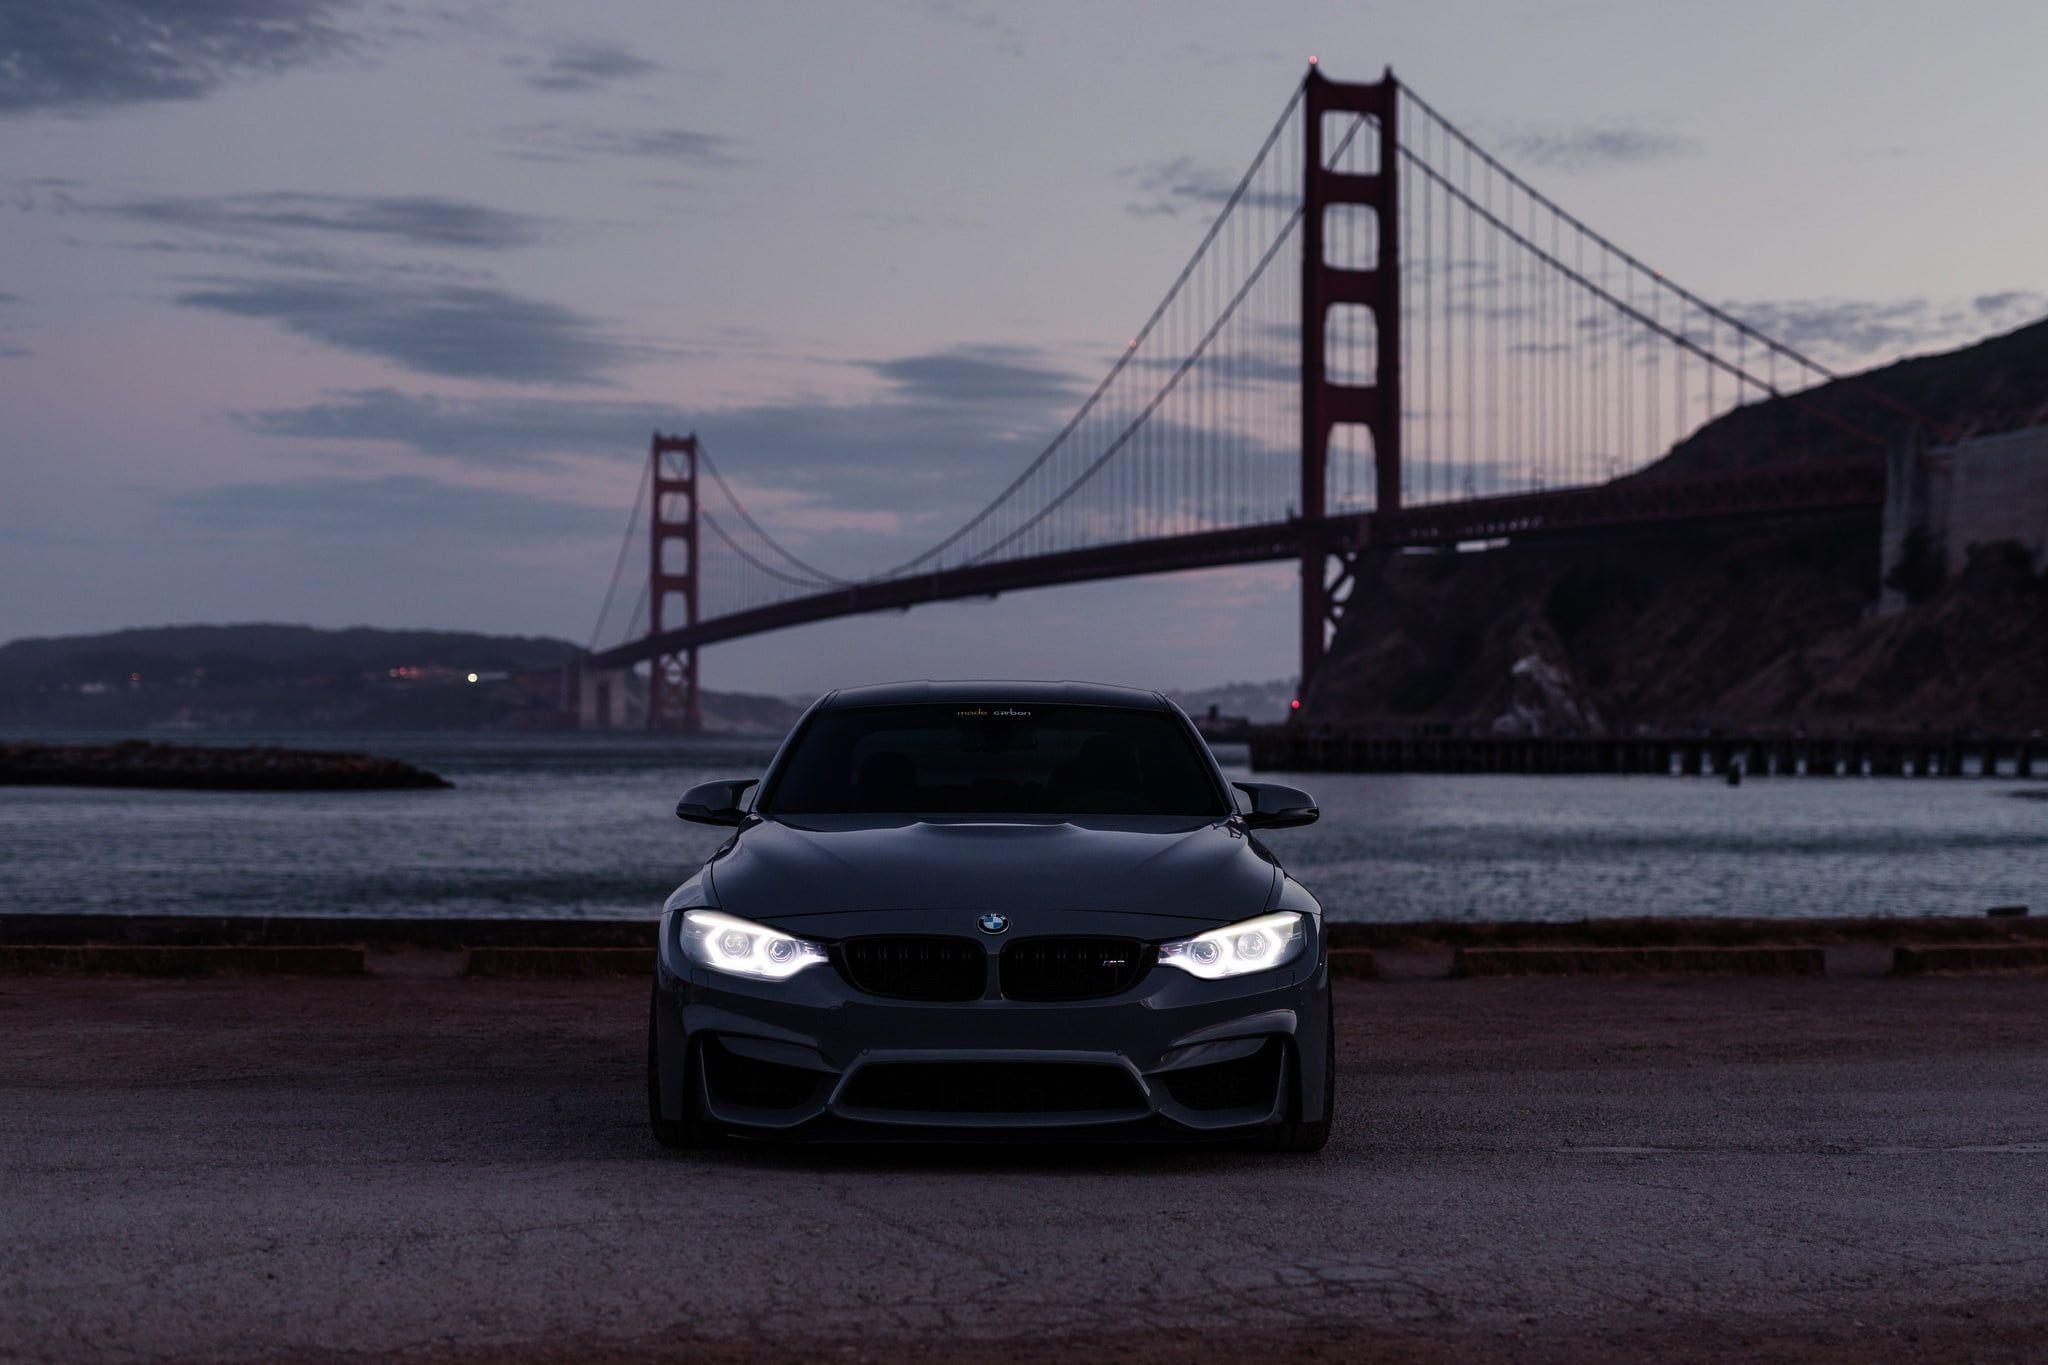 Gray Bmw Car Bmw F83 Nardo Grey 1080p Wallpaper Hdwallpaper Desktop Bmw Grey Bmw Nardo Grey